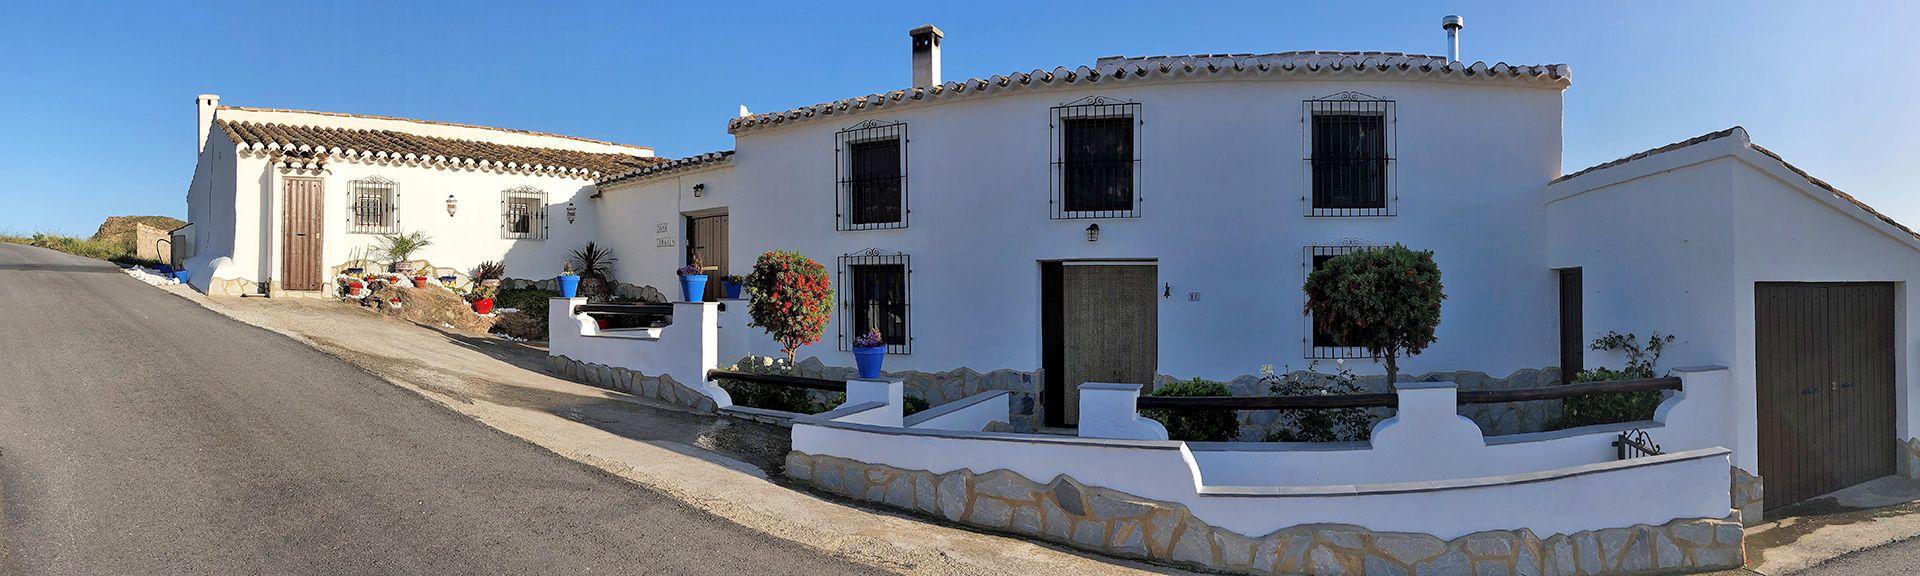 Casa Limaria - Street view